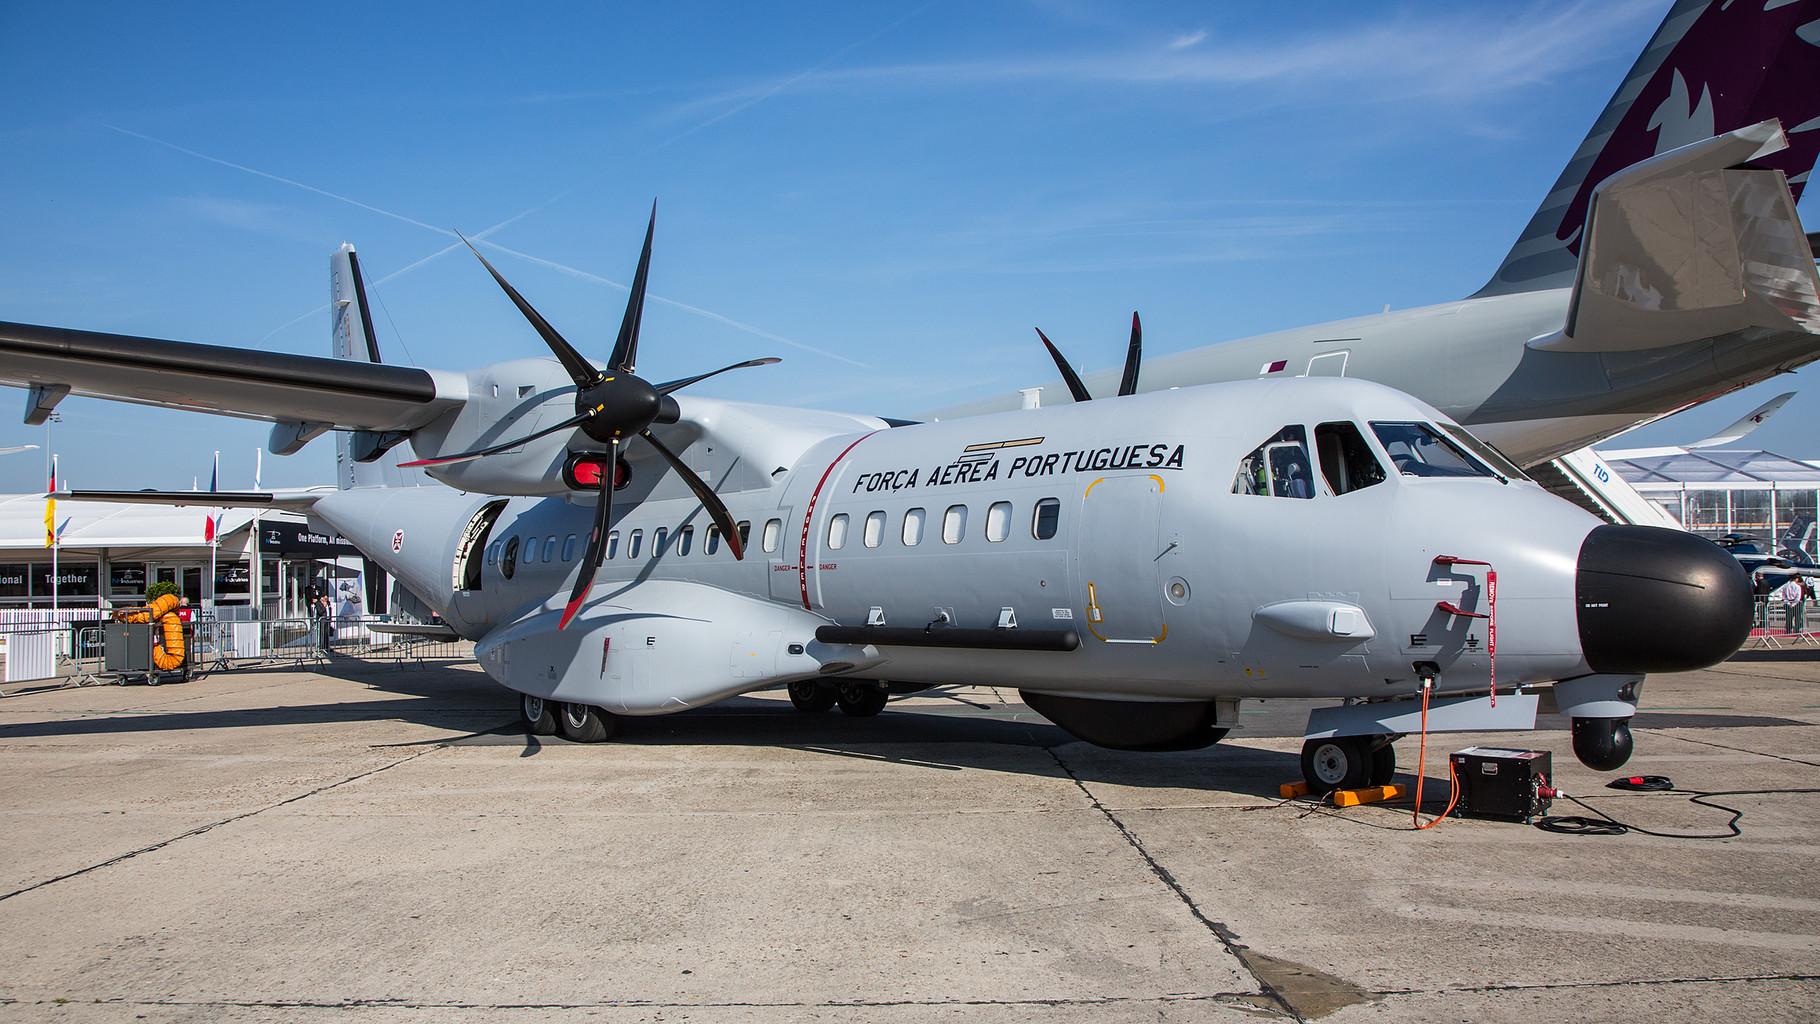 CASA C 295 für Portugal